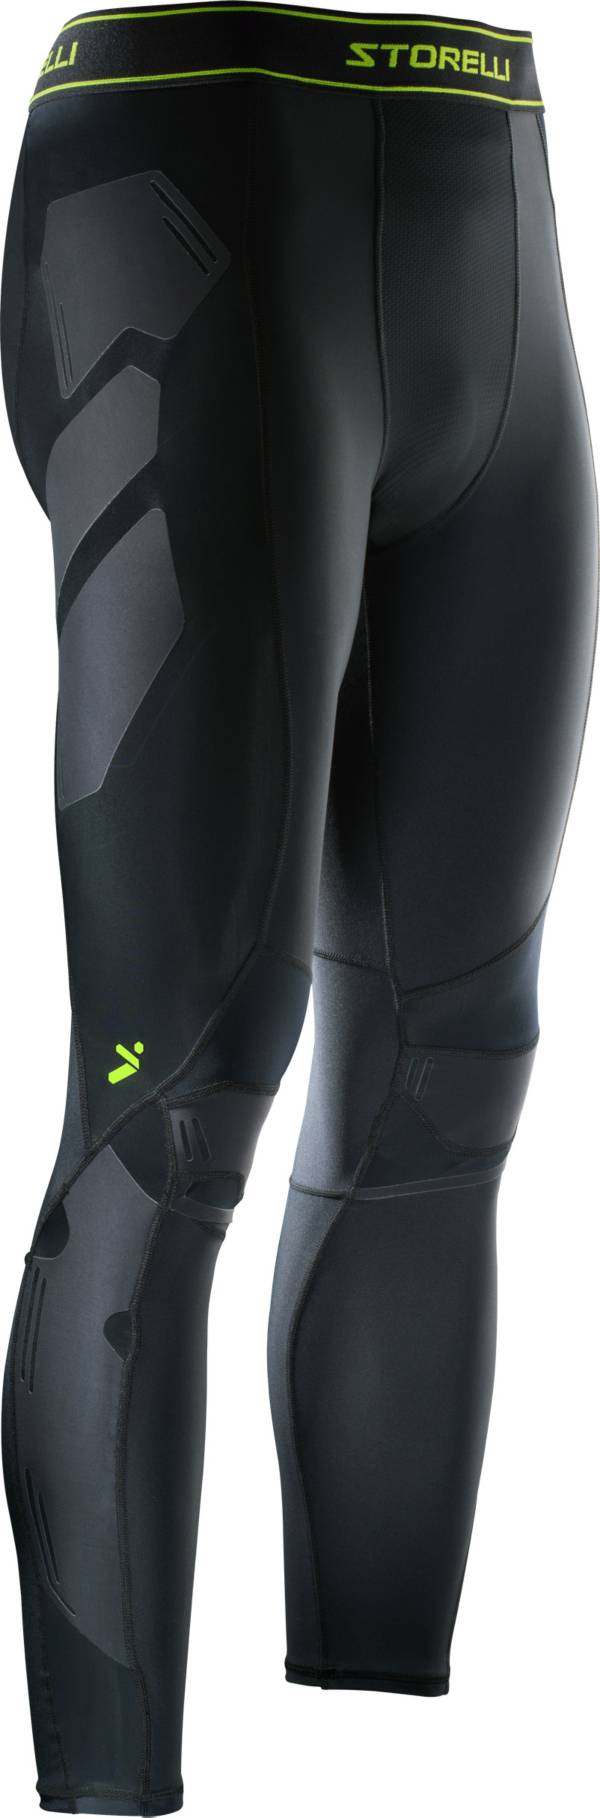 Storelli Adult BodyShield Anti-Abrasion Soccer Leggings product image